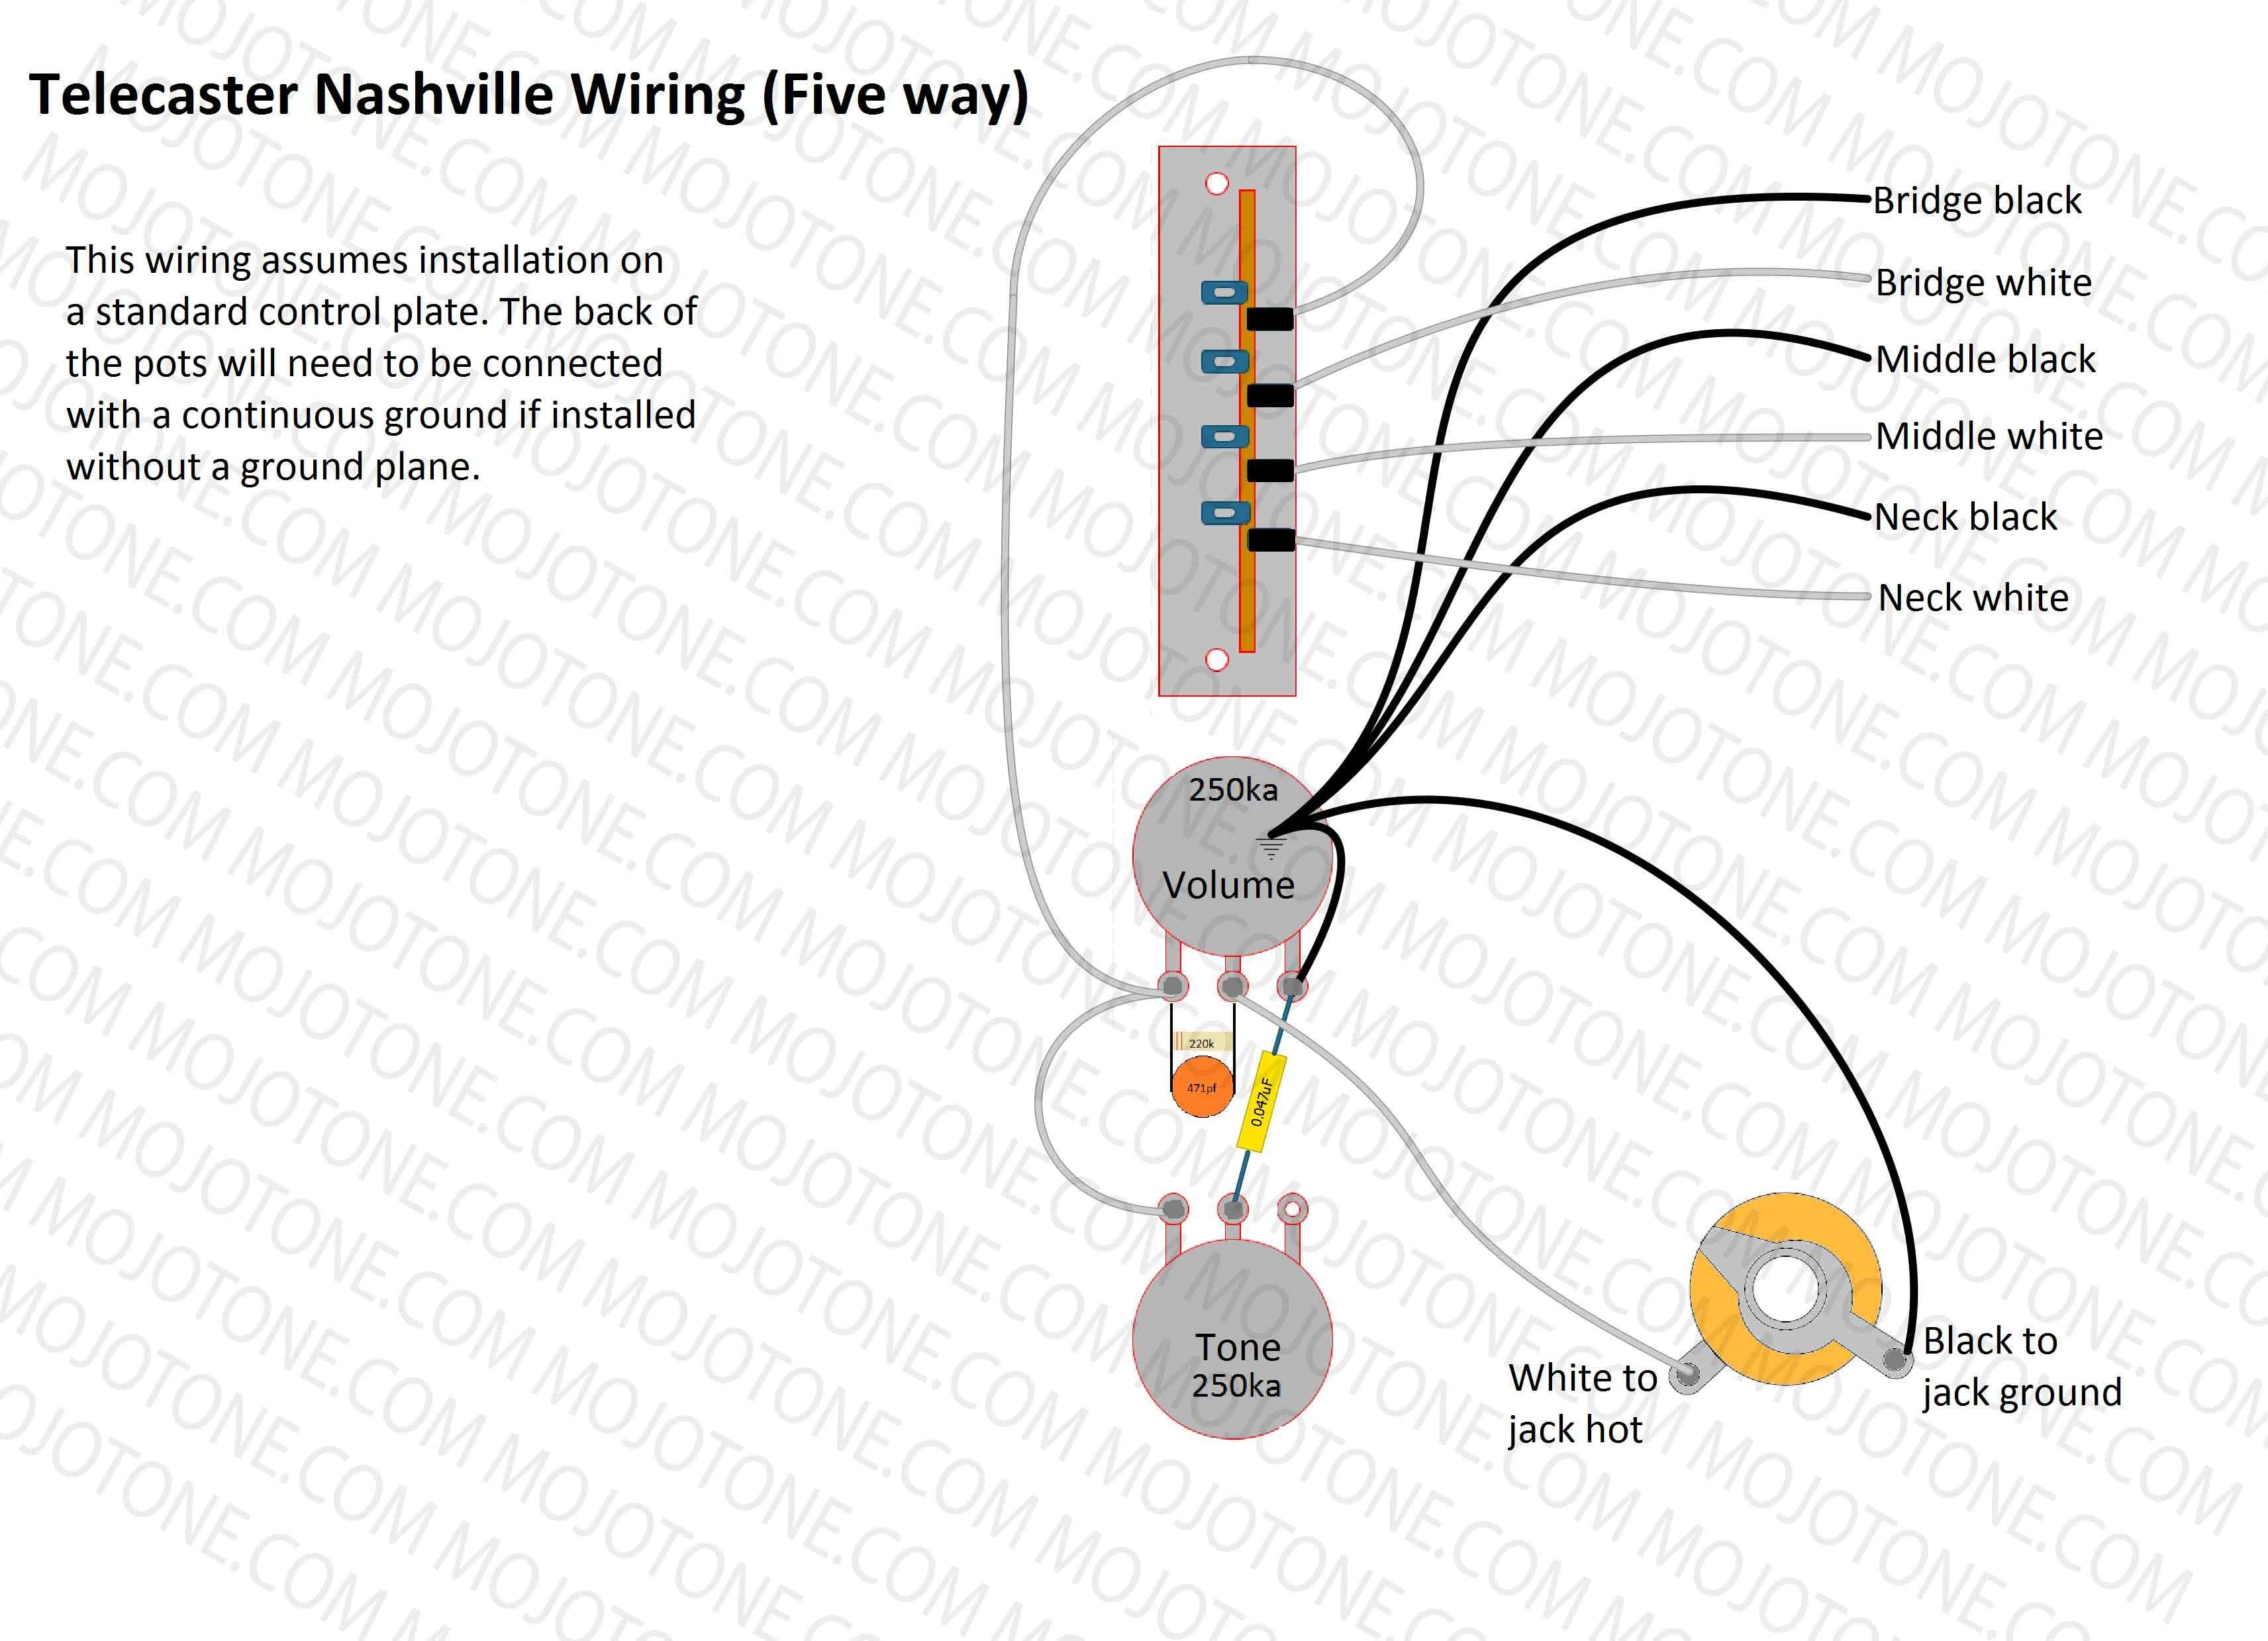 fender telecaster wiring diagram pioneer car stereo speaker american data schema library 1971 3 way